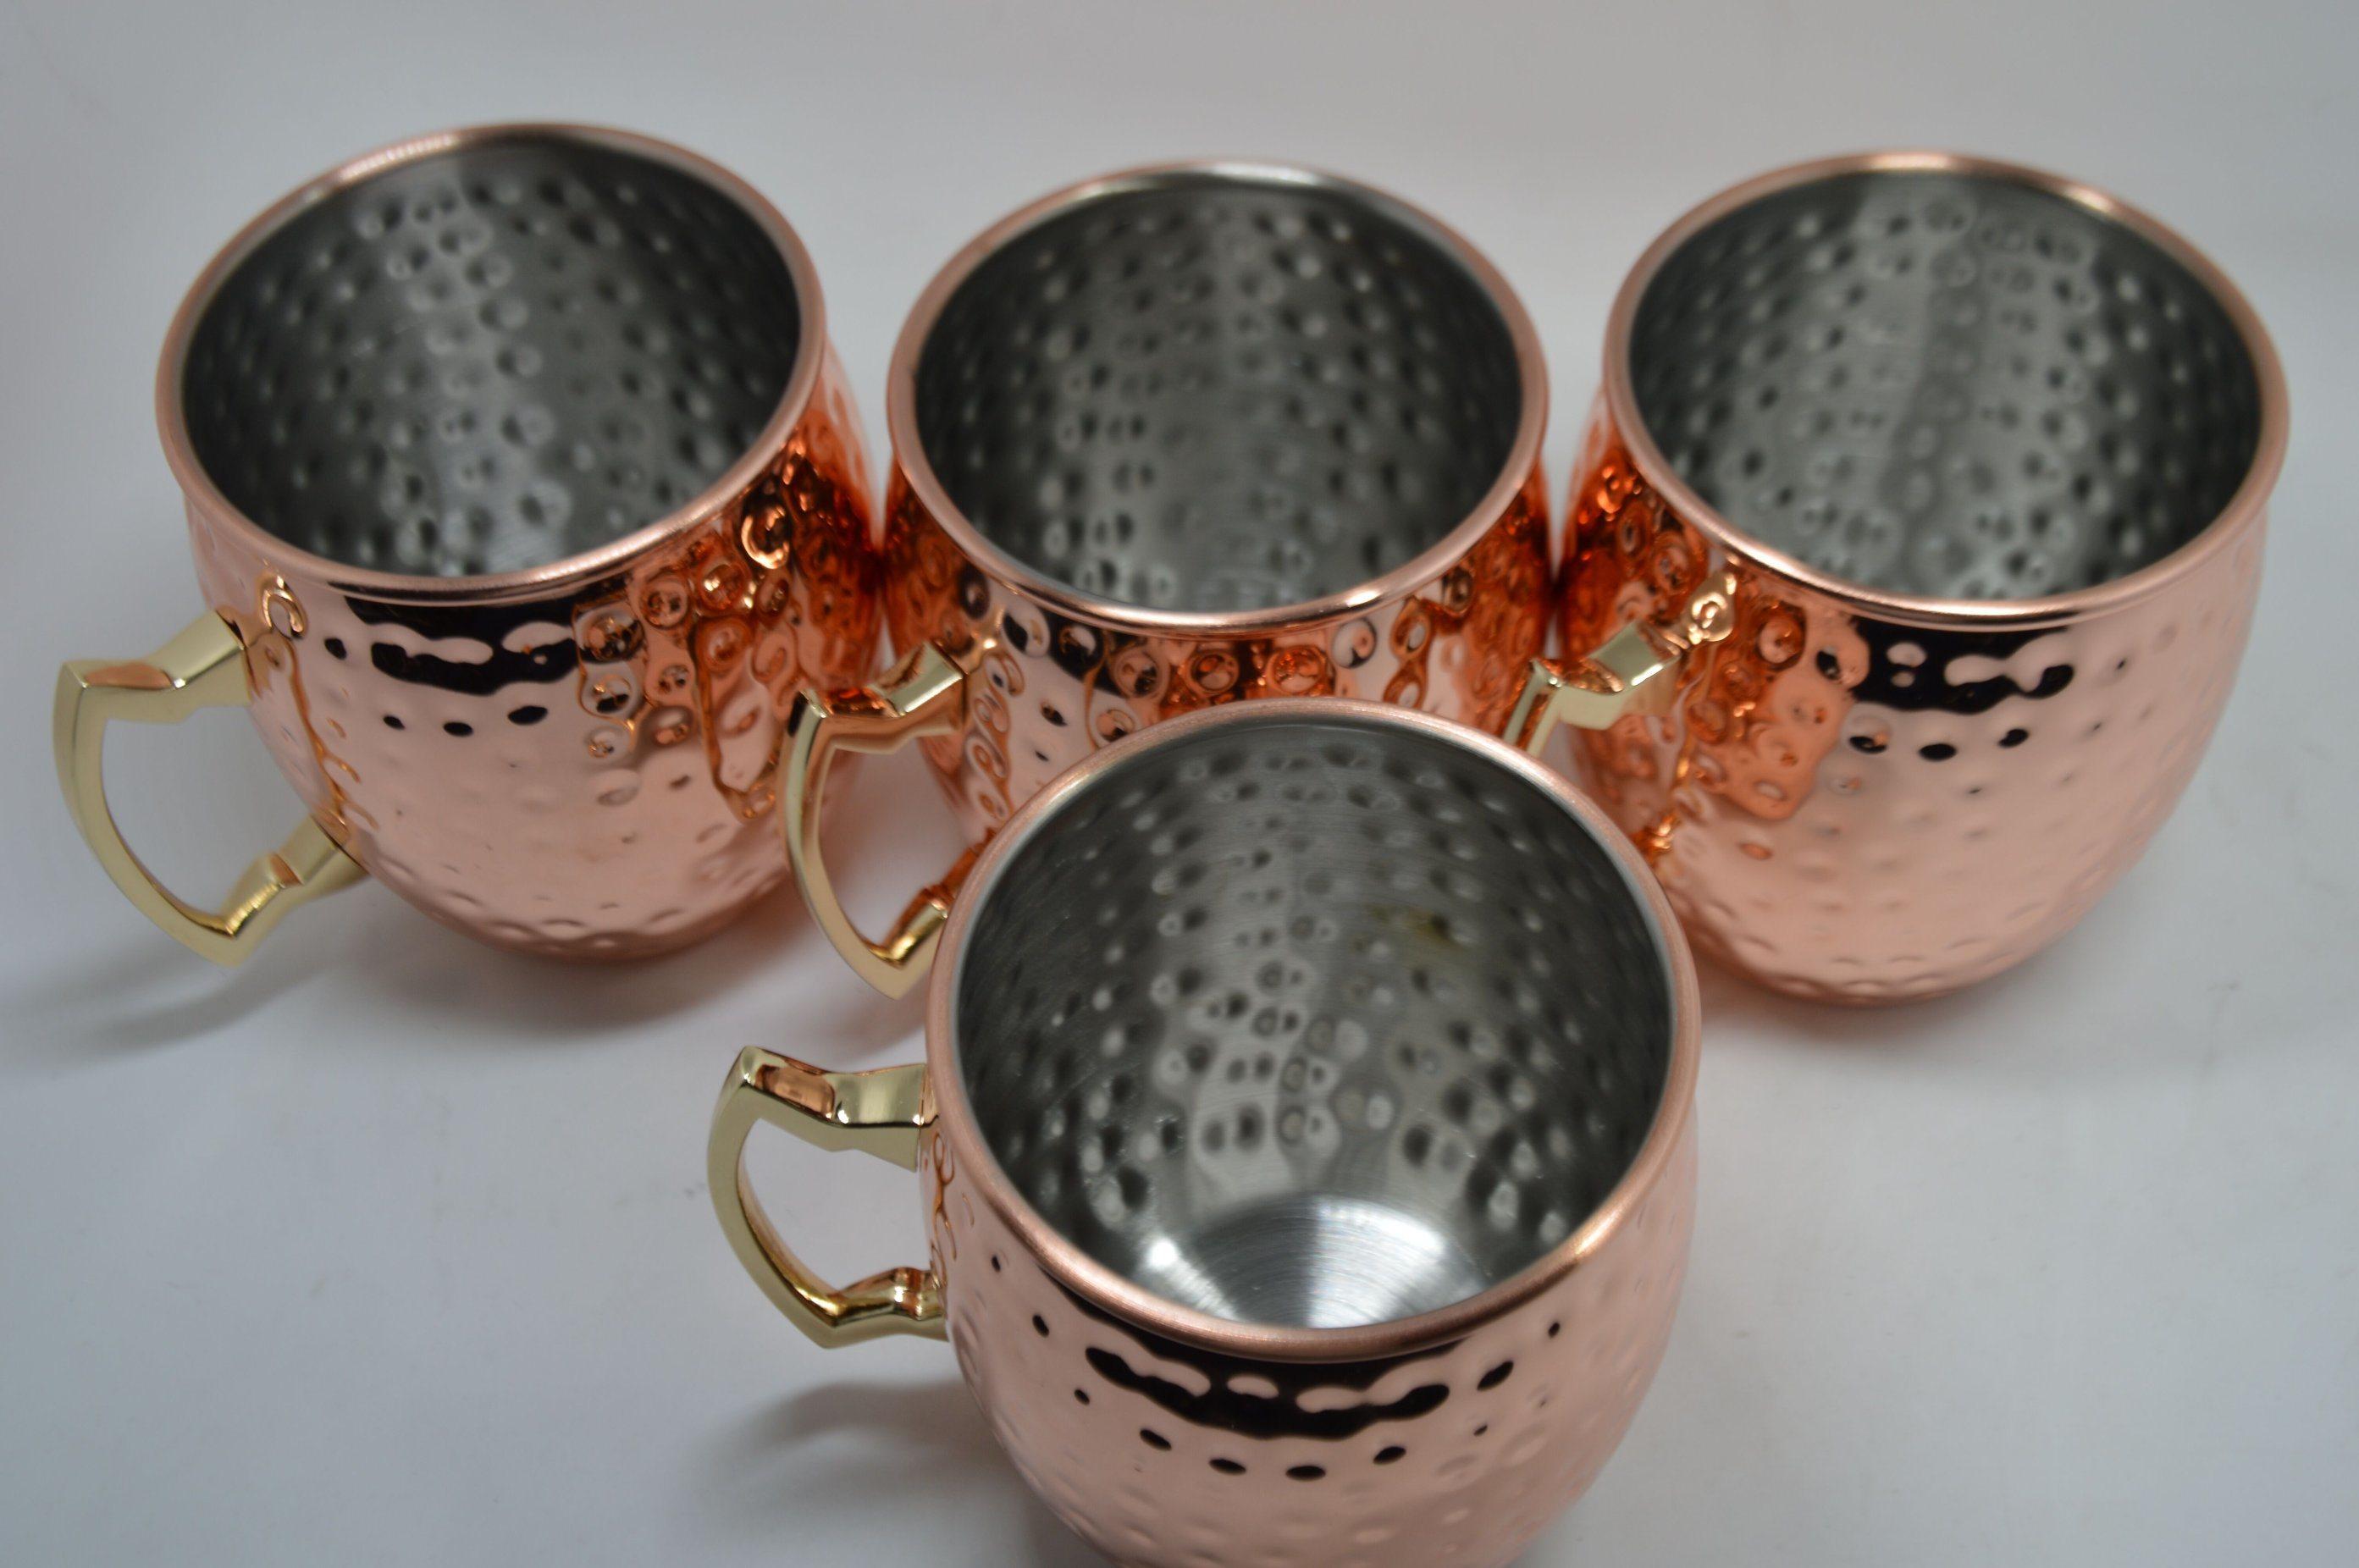 Moscow Mule Copper Mug 16oz